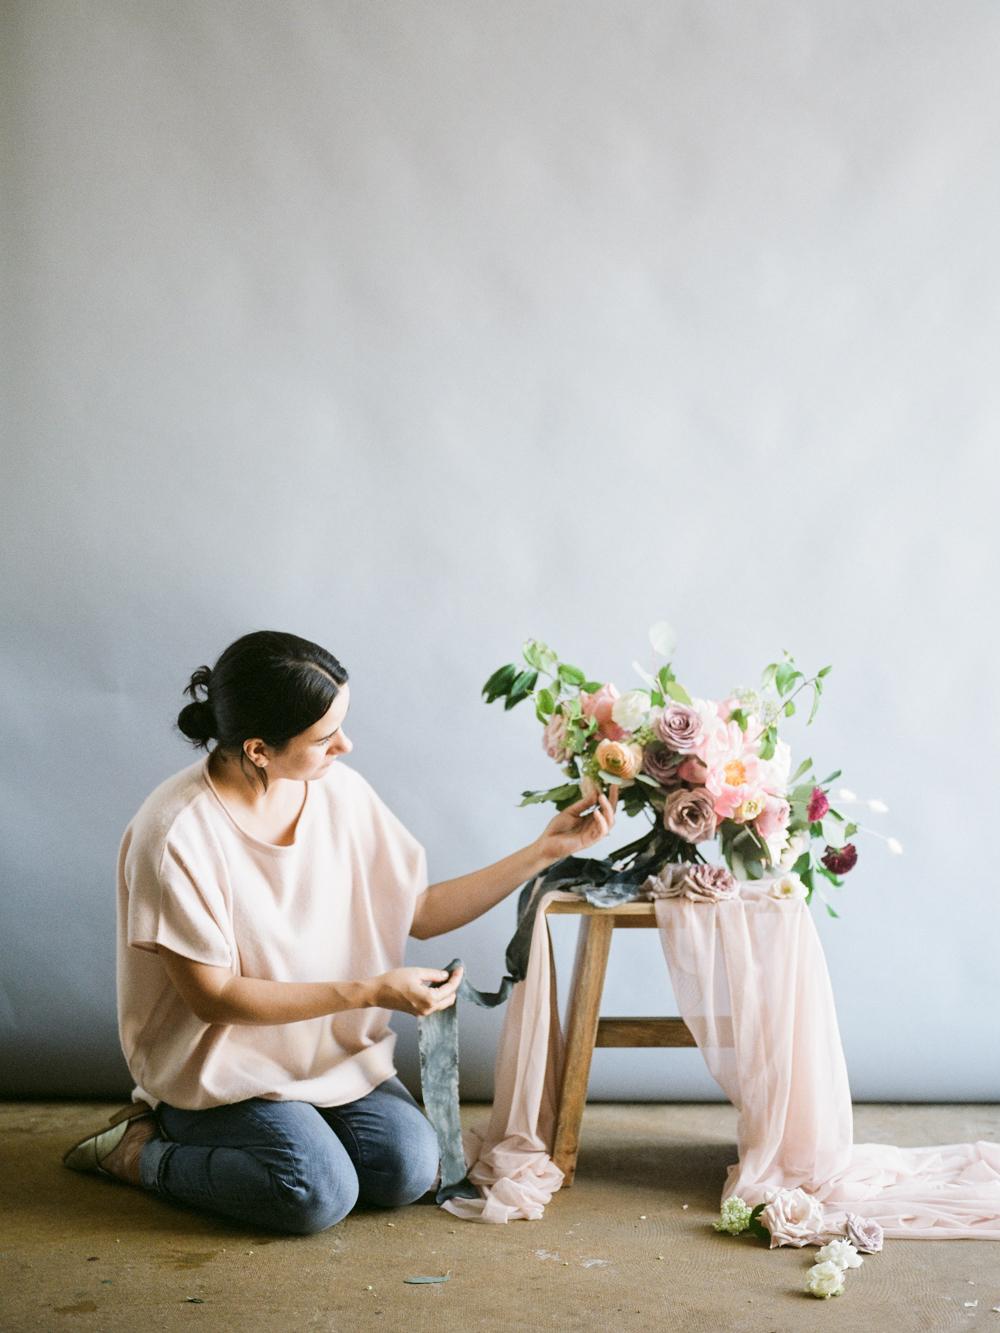 Christine Gosch - brand photographer - Maxit flower design - wedding florist-1.jpg